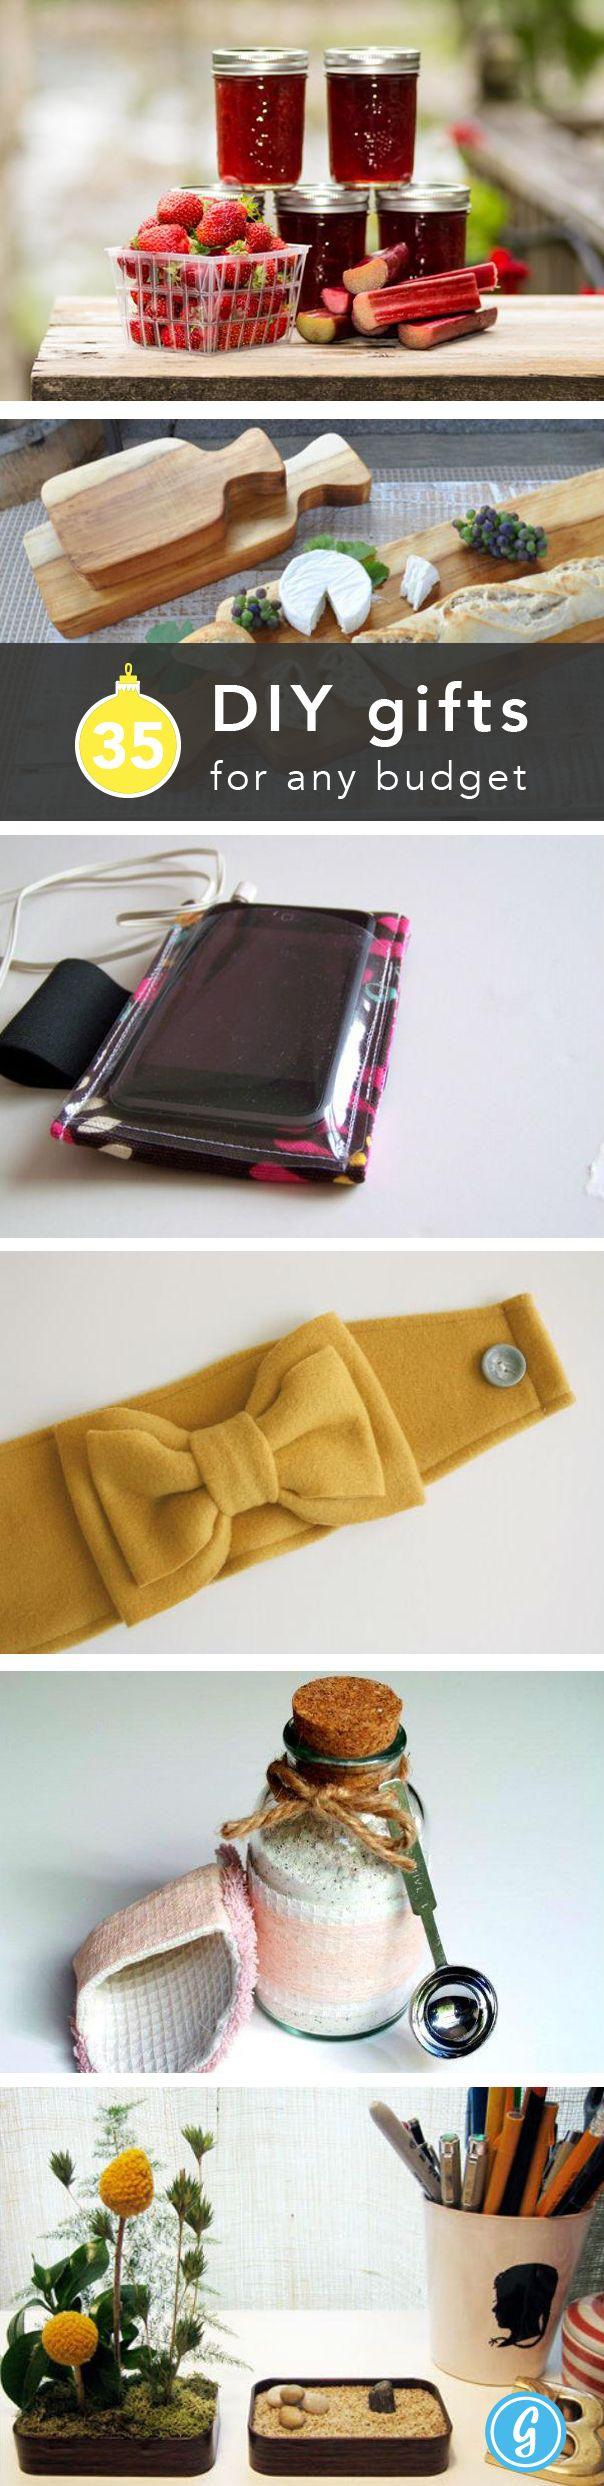 35 DIY gift ideas